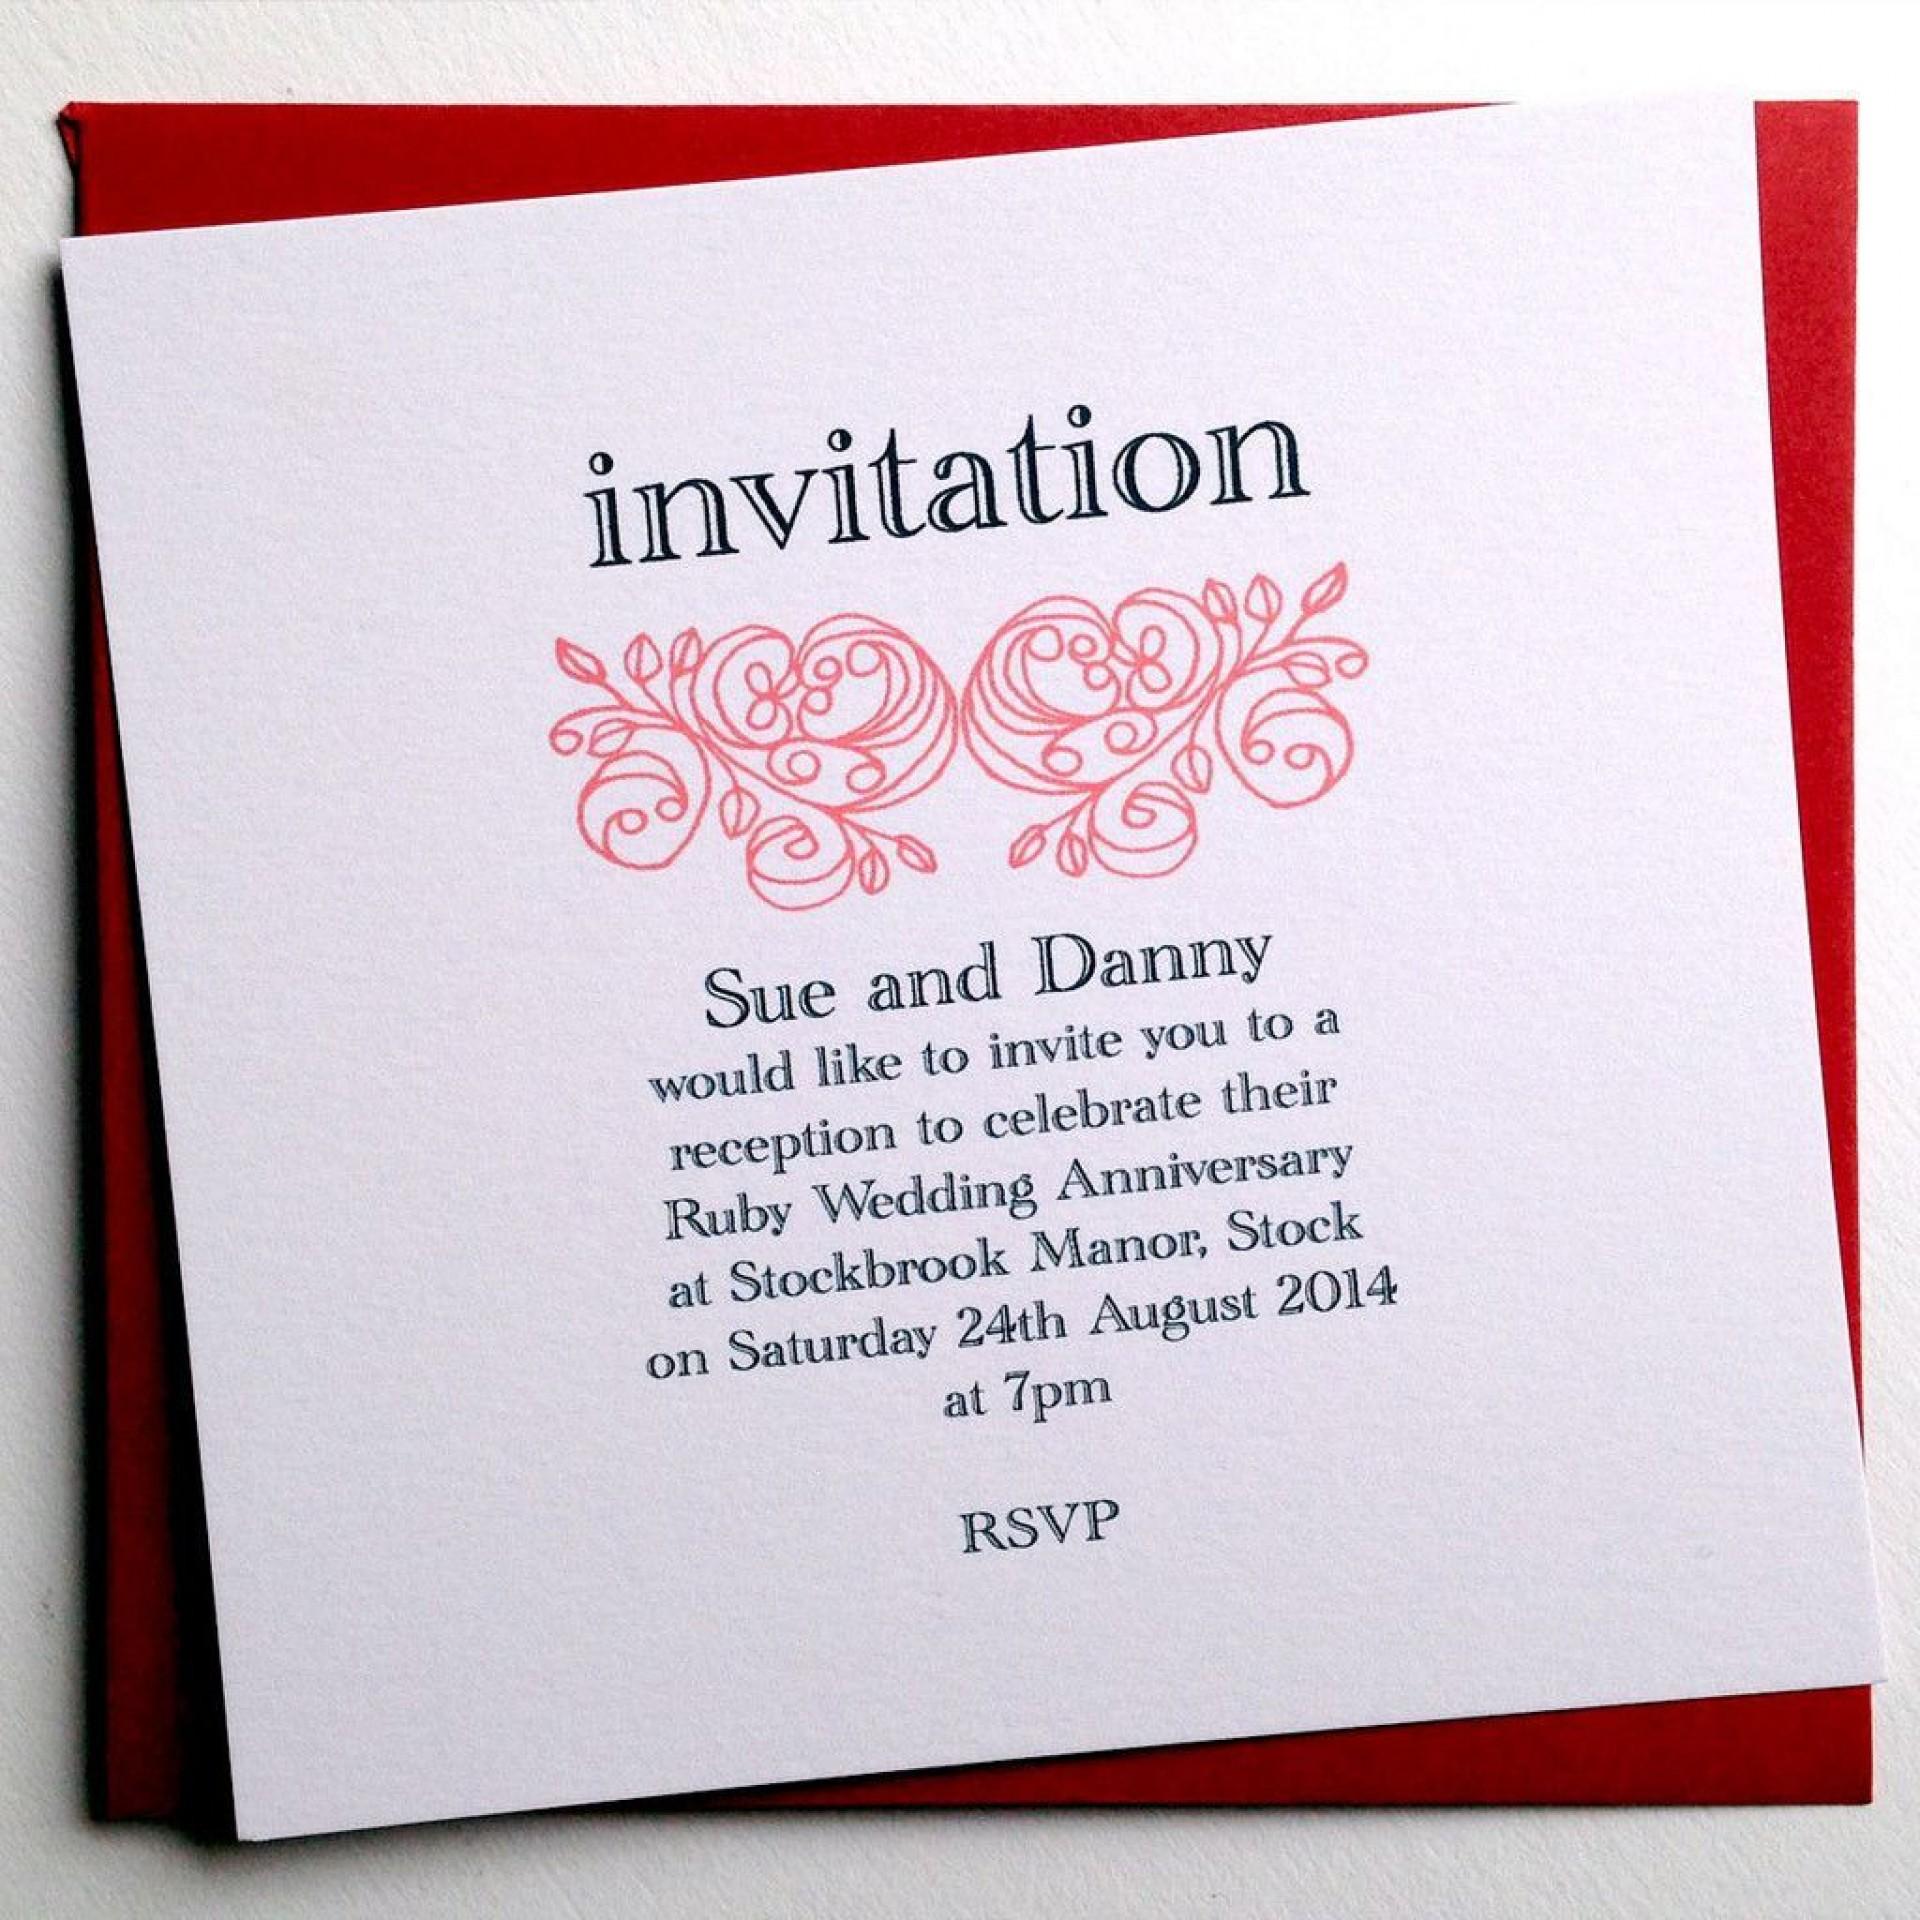 001 Phenomenal 50th Anniversary Invitation Wording Sample Concept  Samples Wedding Card1920